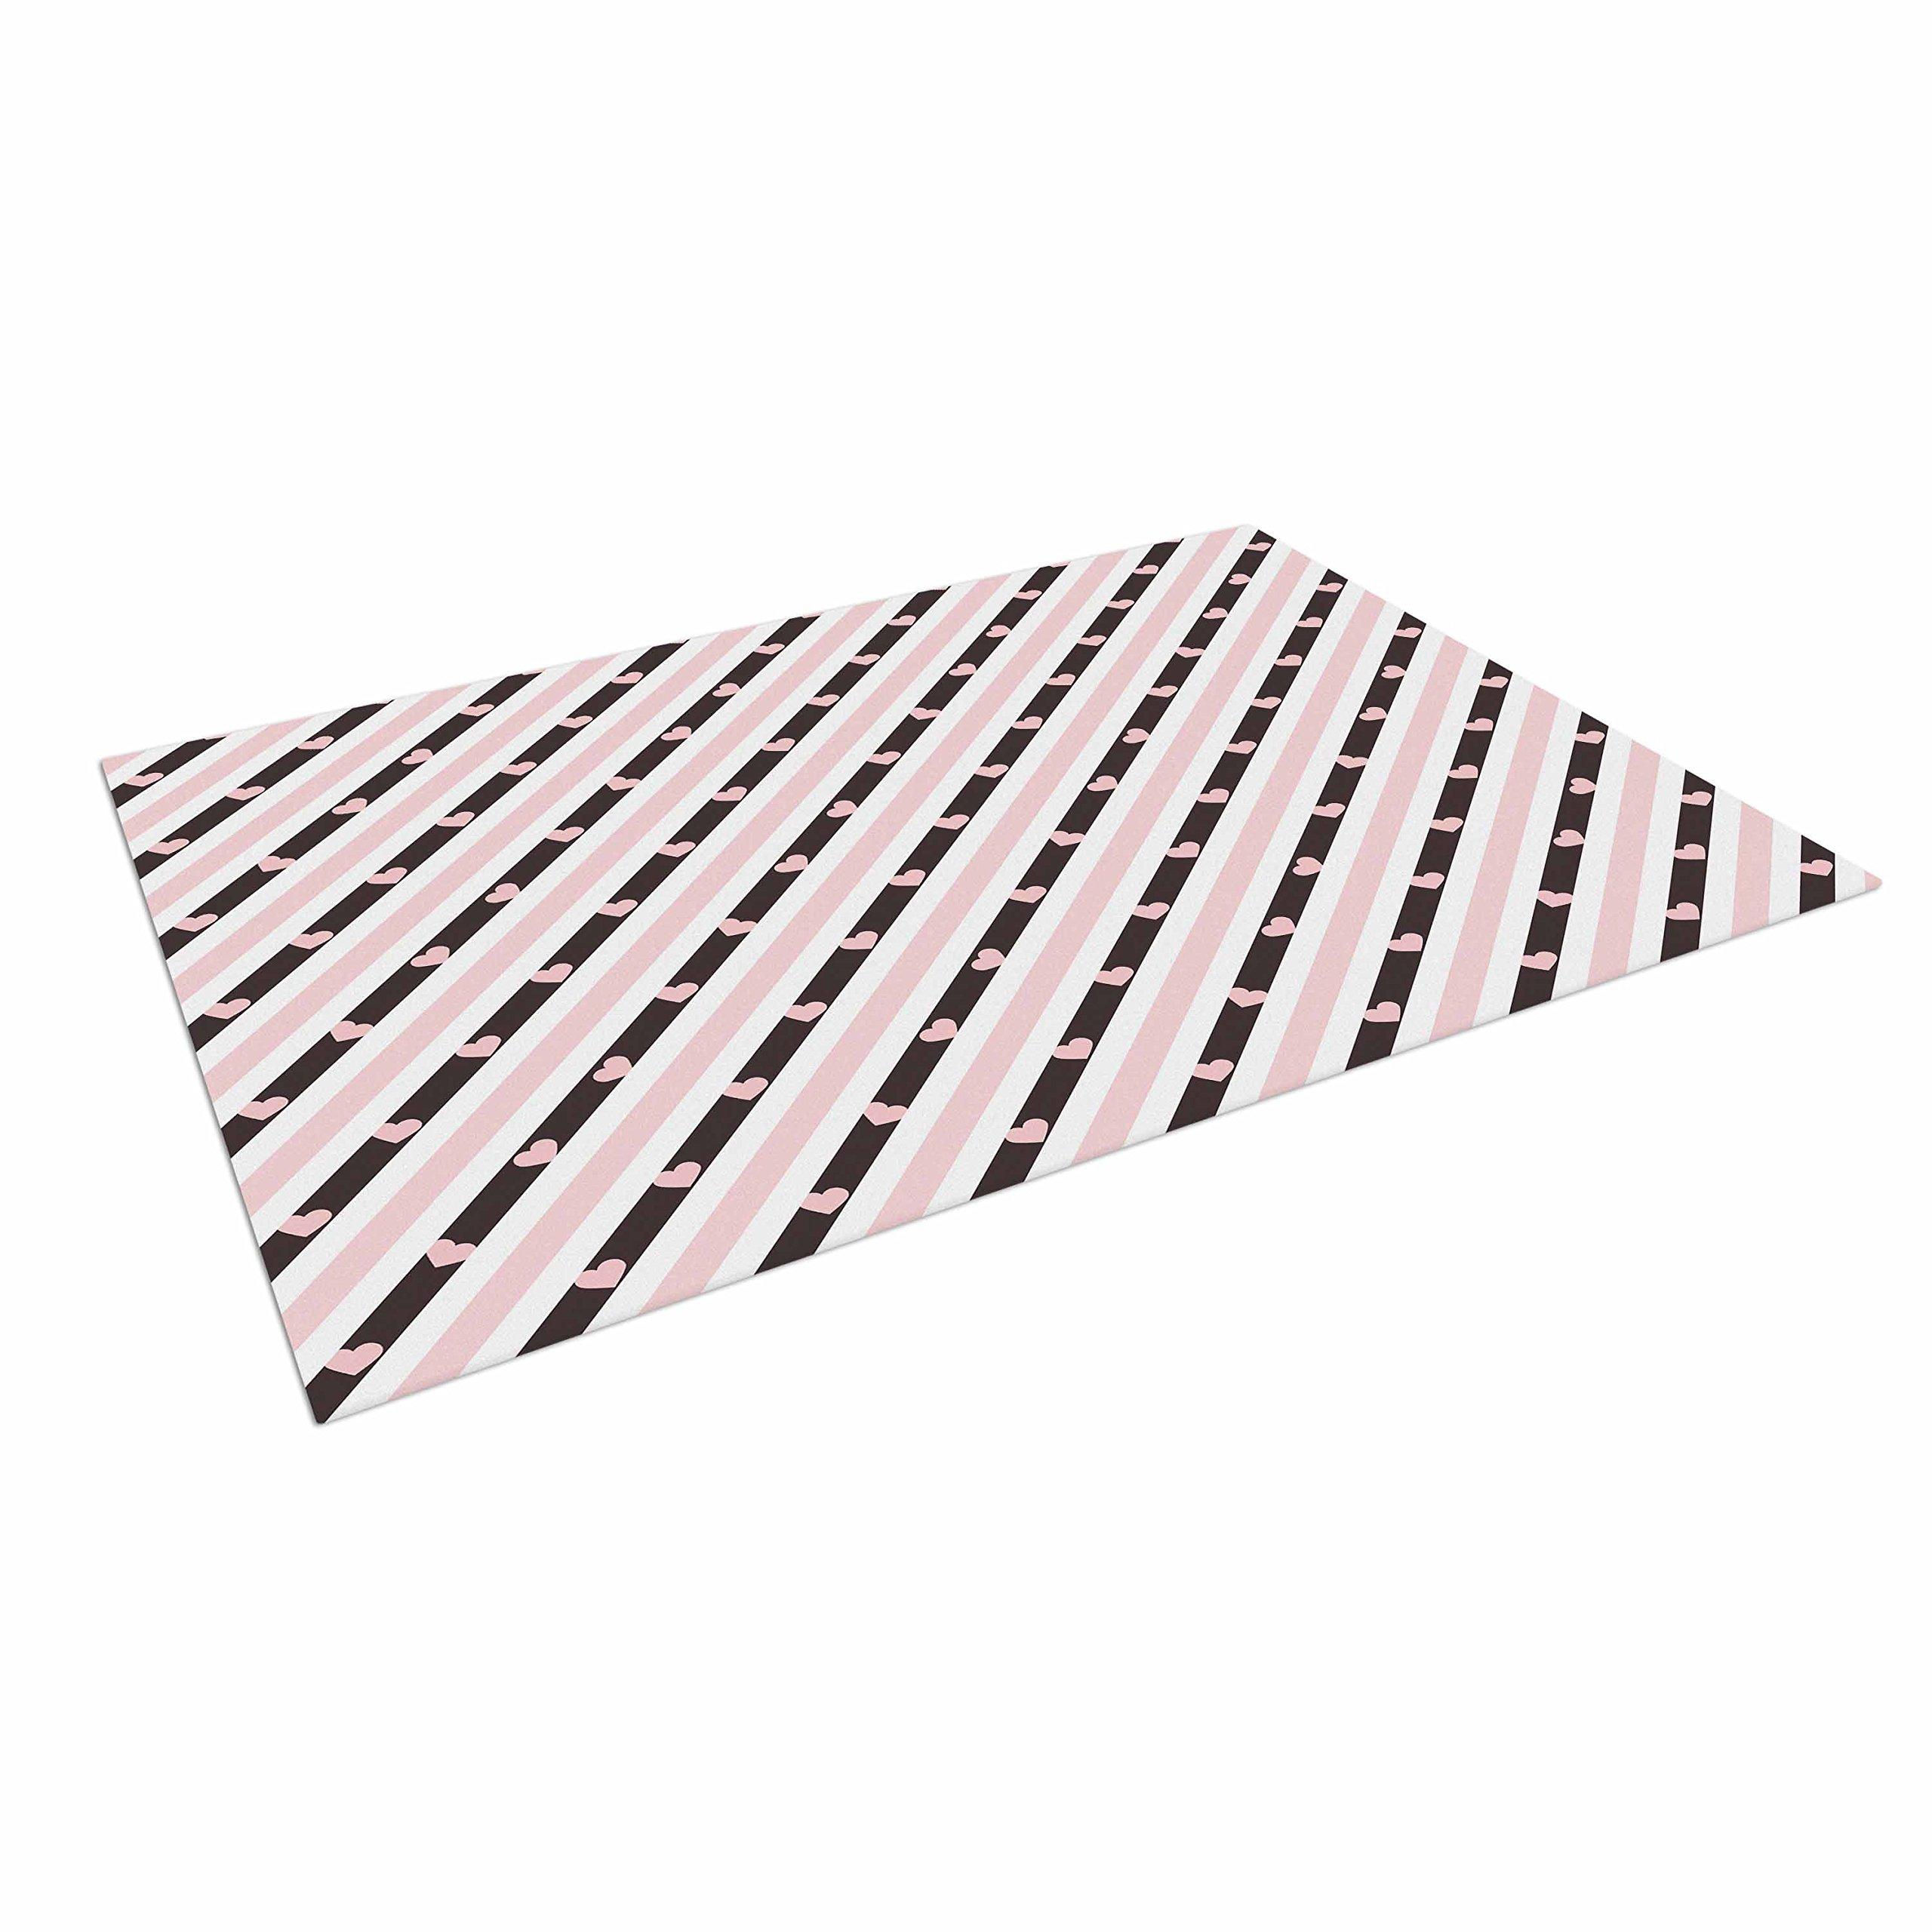 KESS InHouse Vasare Nar ''Pastel Stripe Heart'' Pink Love Outdoor Floor Mat, 4' x 5' by Kess InHouse (Image #1)